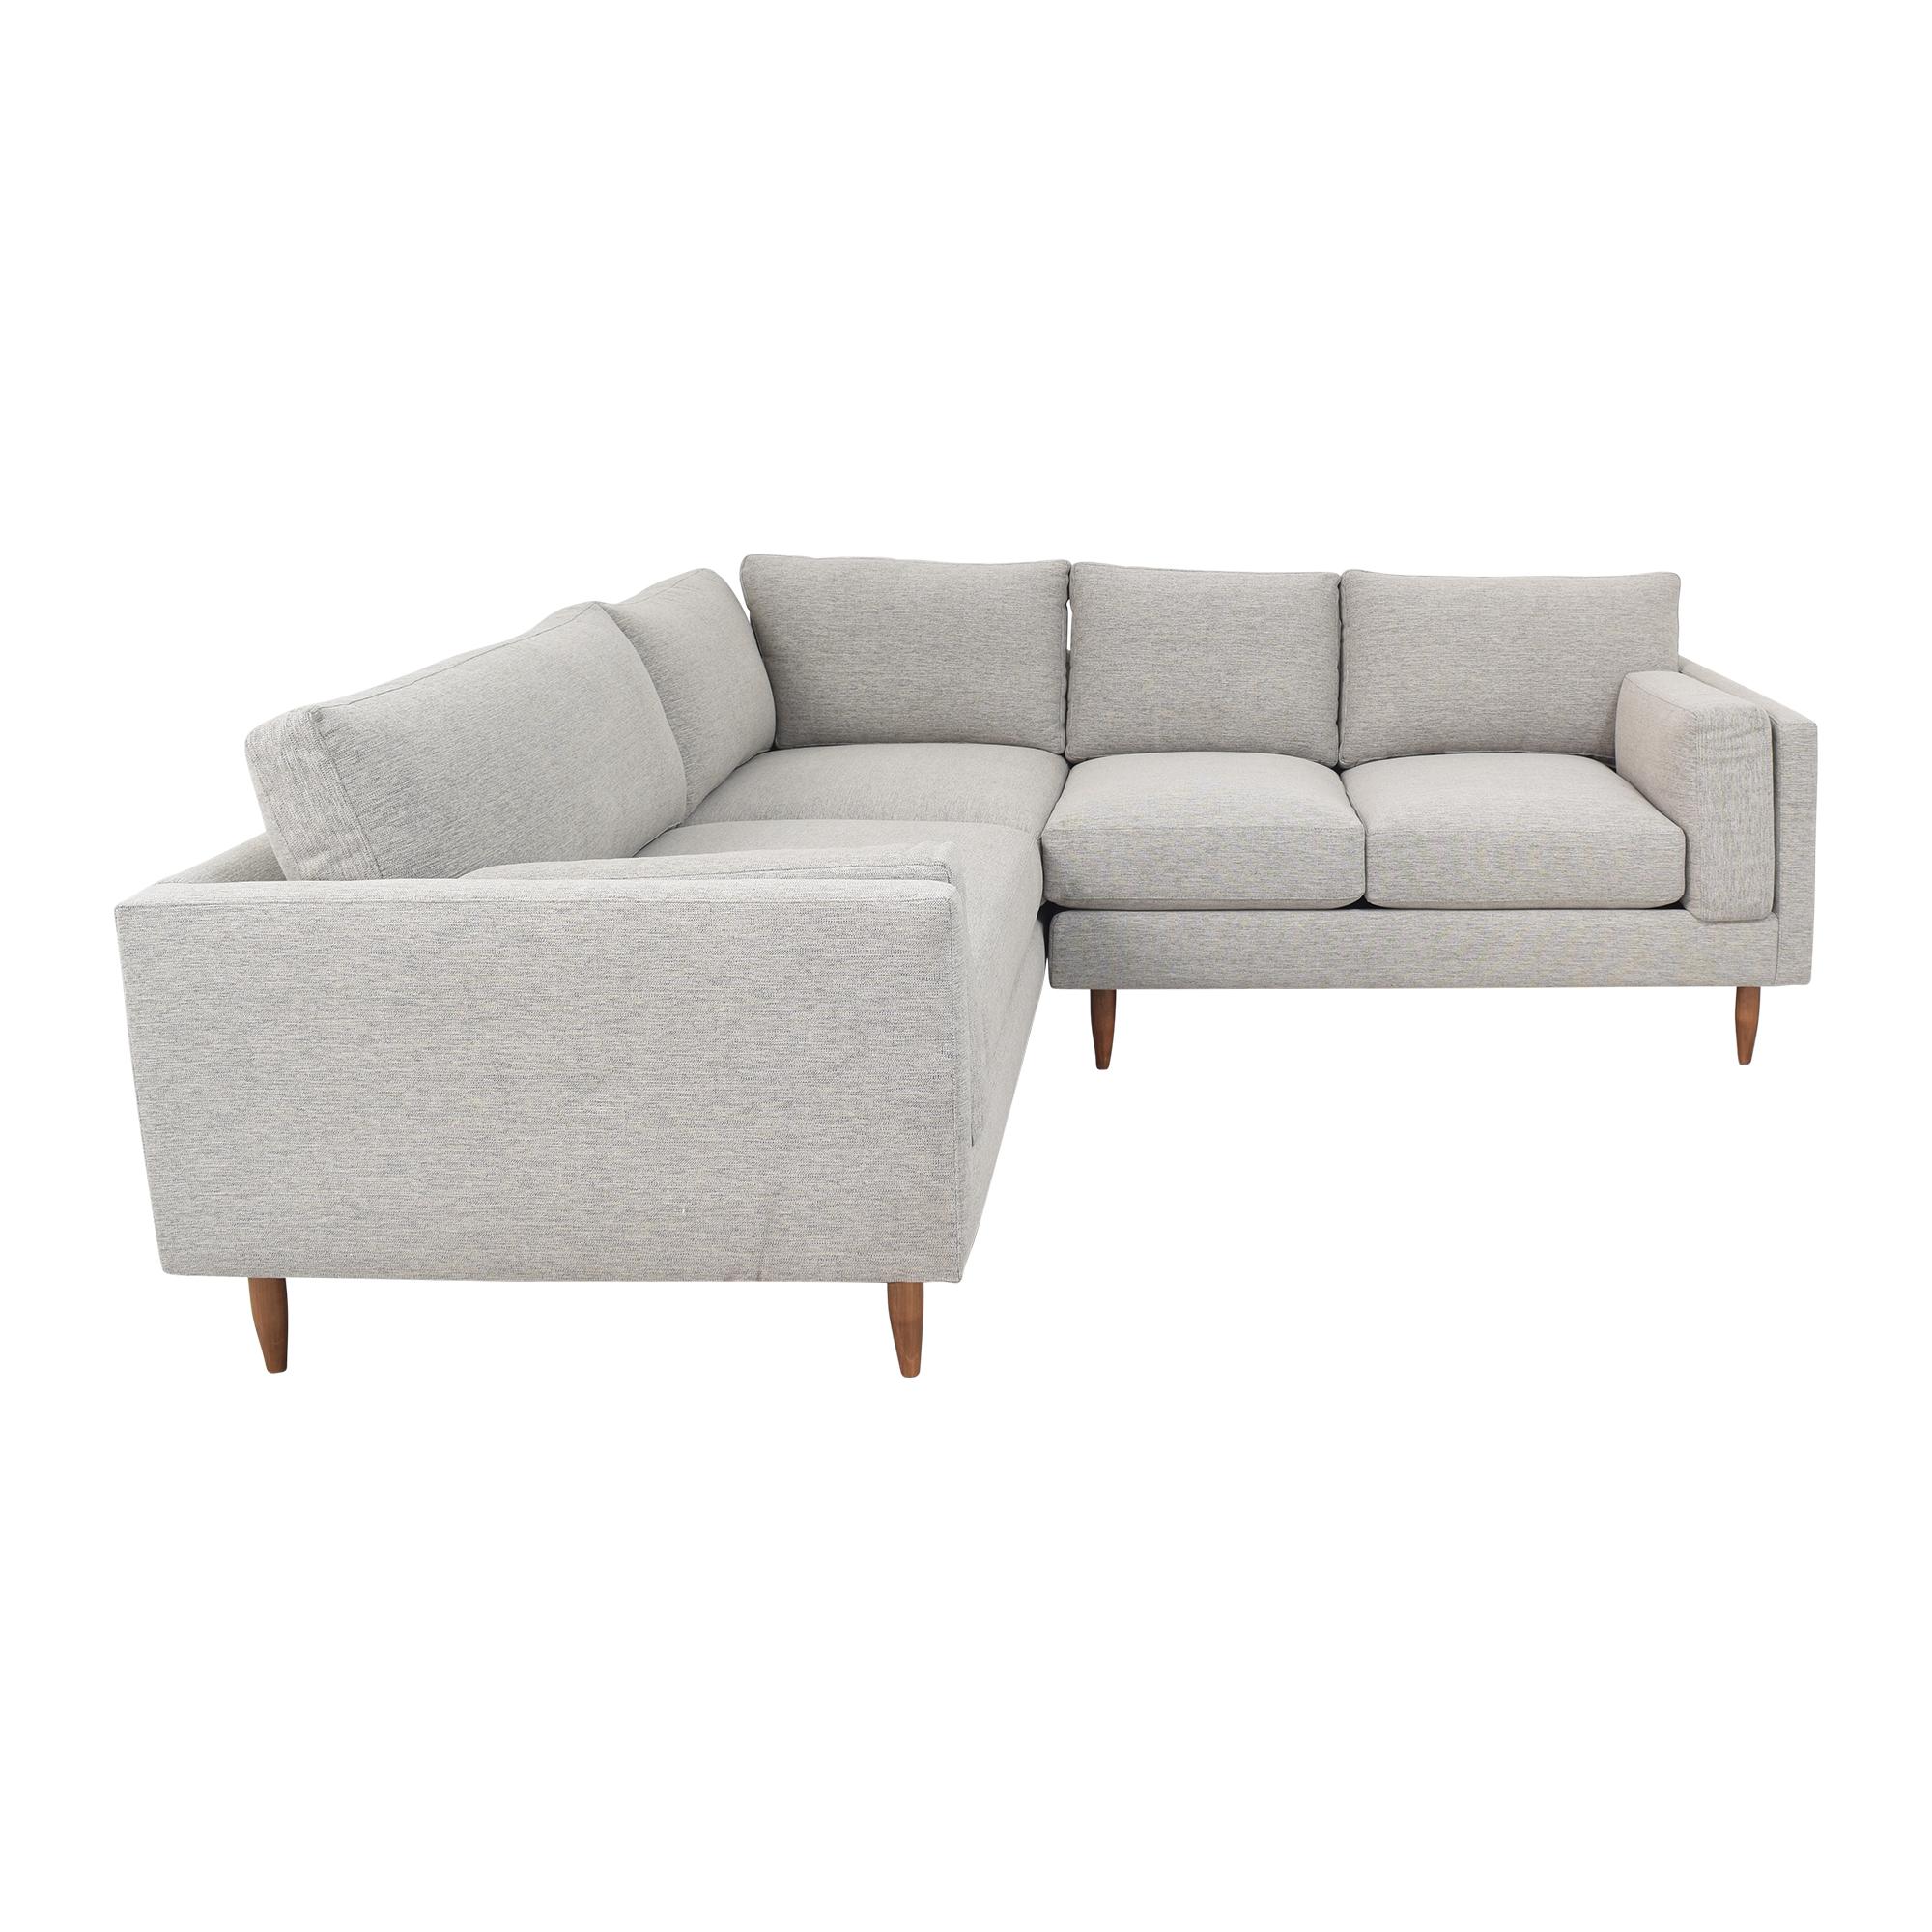 BenchMade Modern BenchMade Modern Skinny Fat Sectional Sofa ct